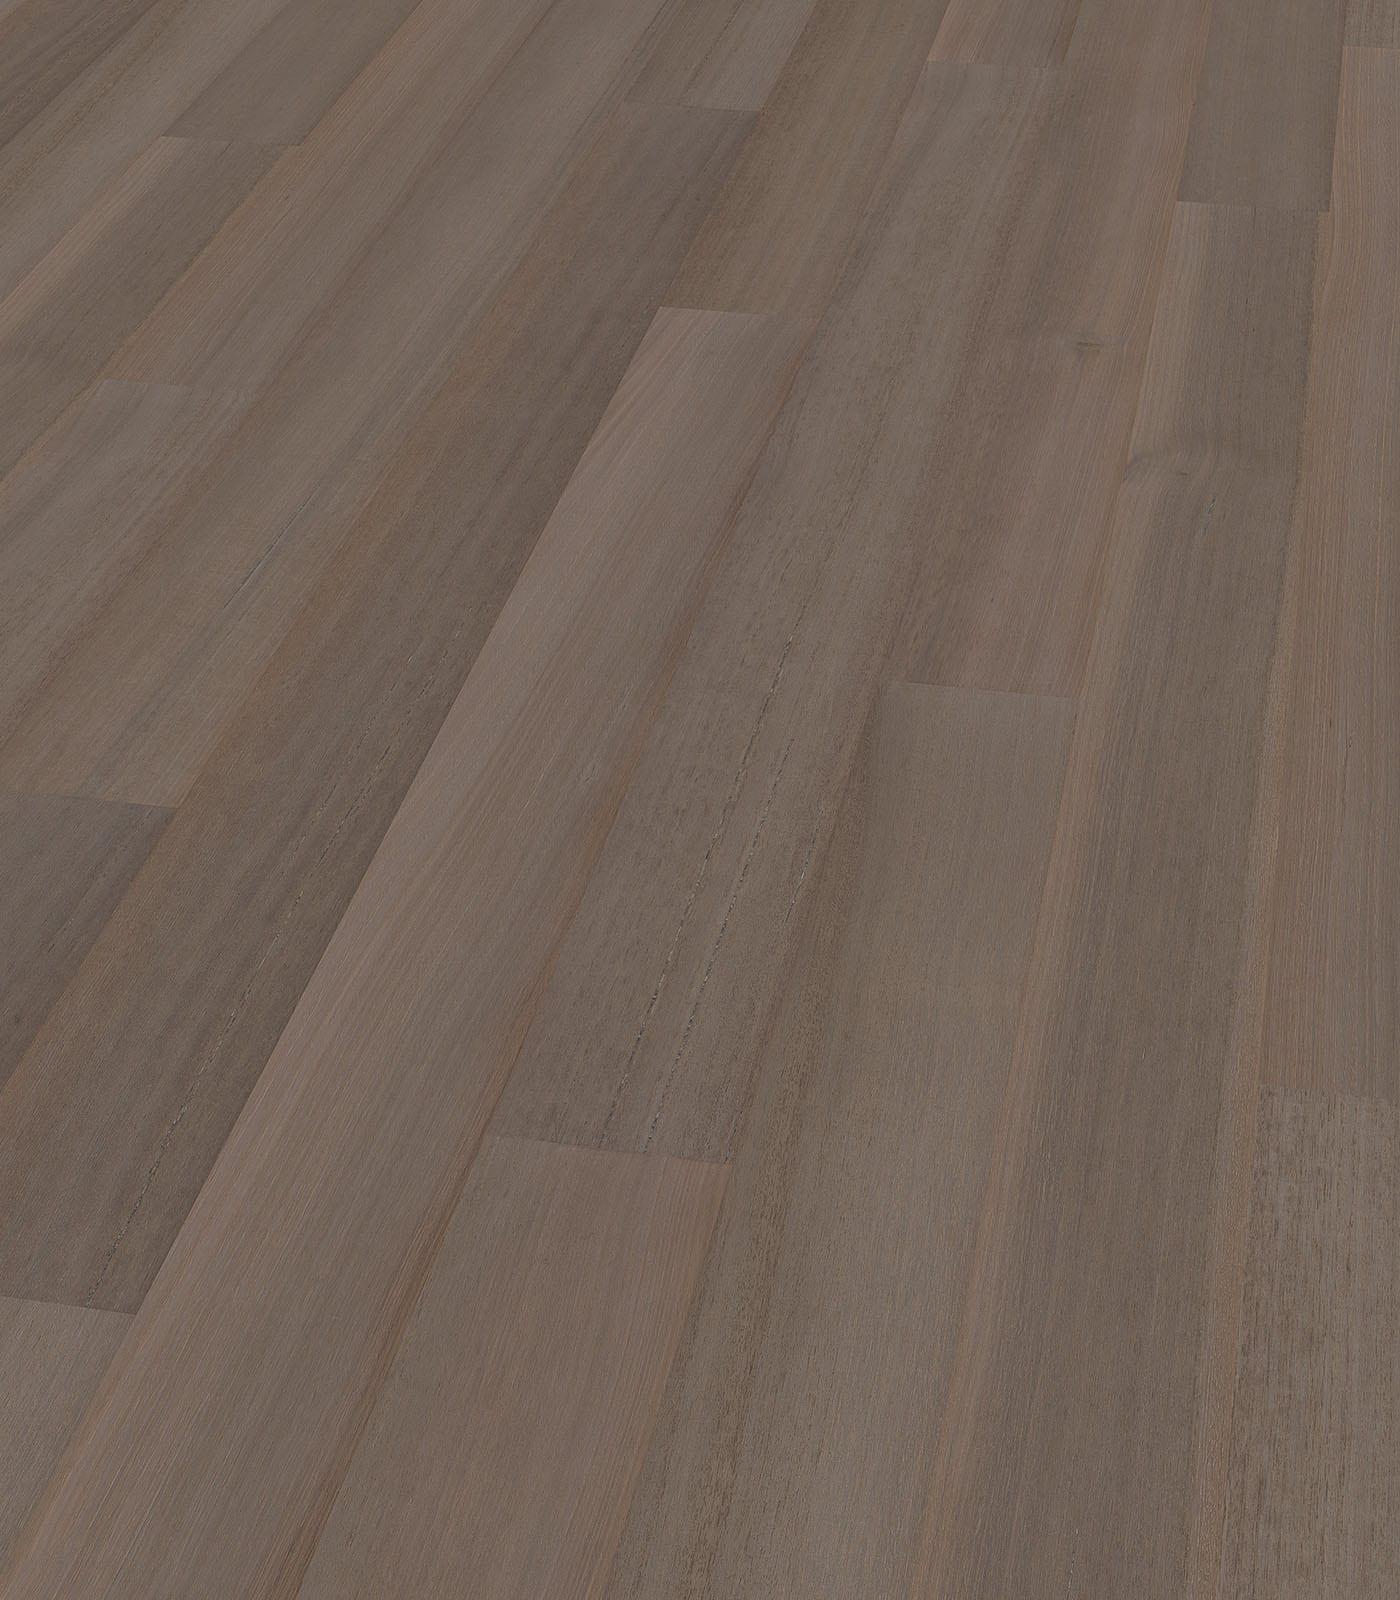 Brisbane-After Oak Collection-Tasmanian Oak floors-angle